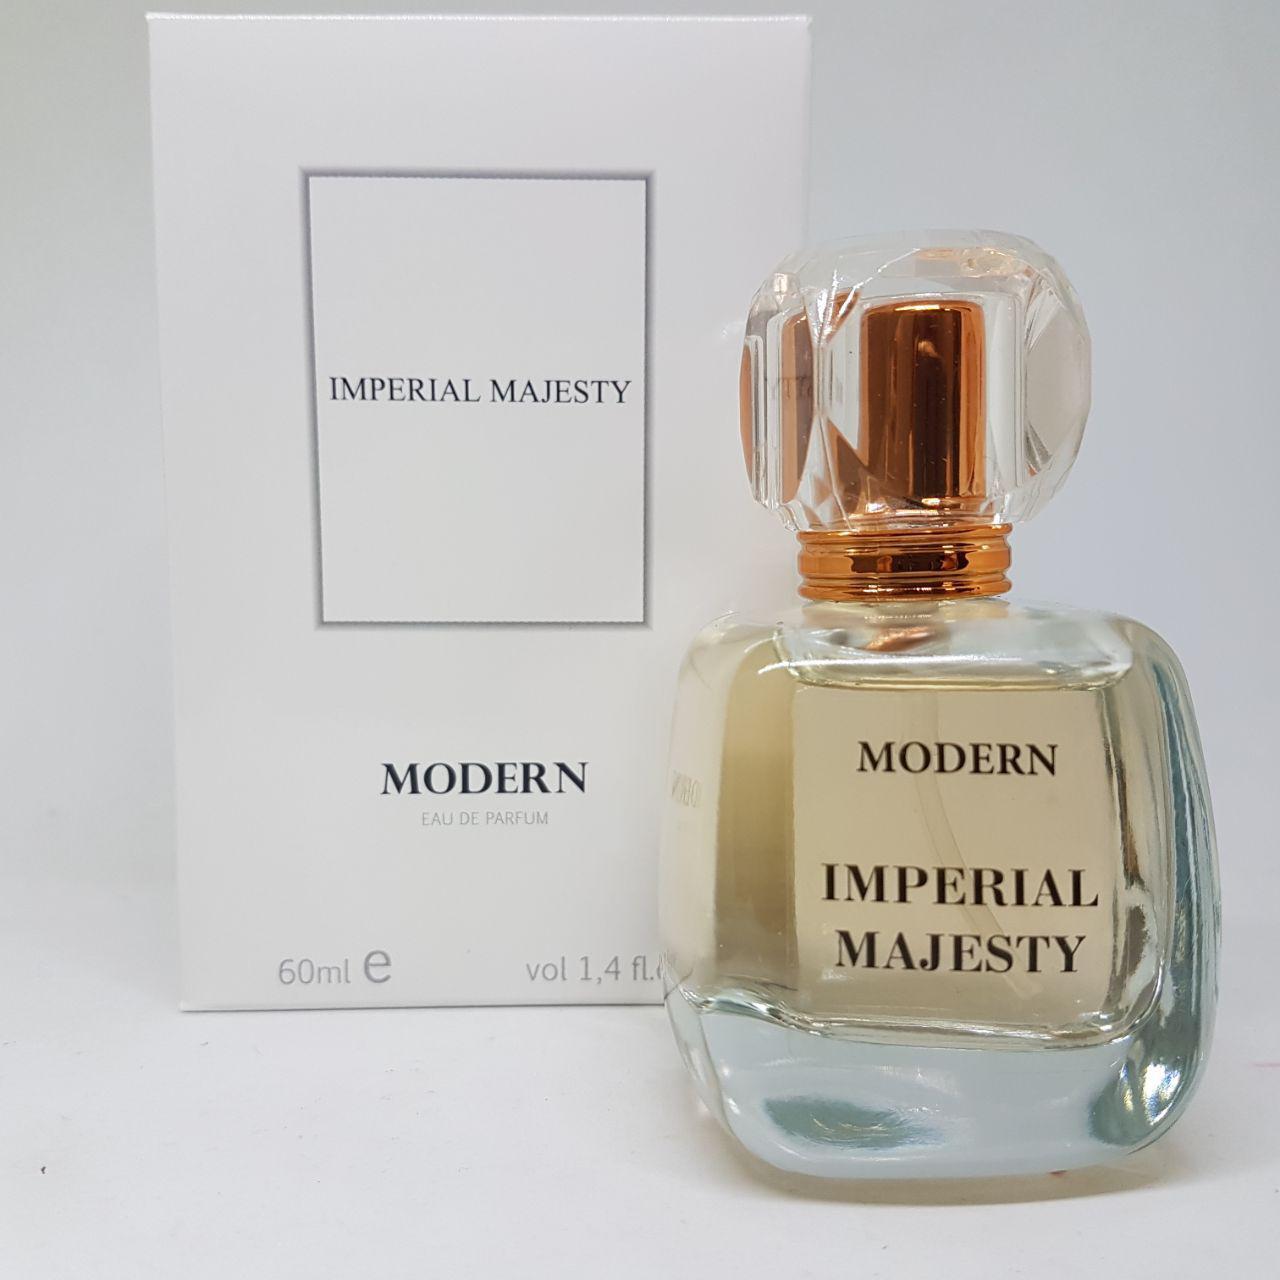 Modern Imperial Majesty edp 60ml